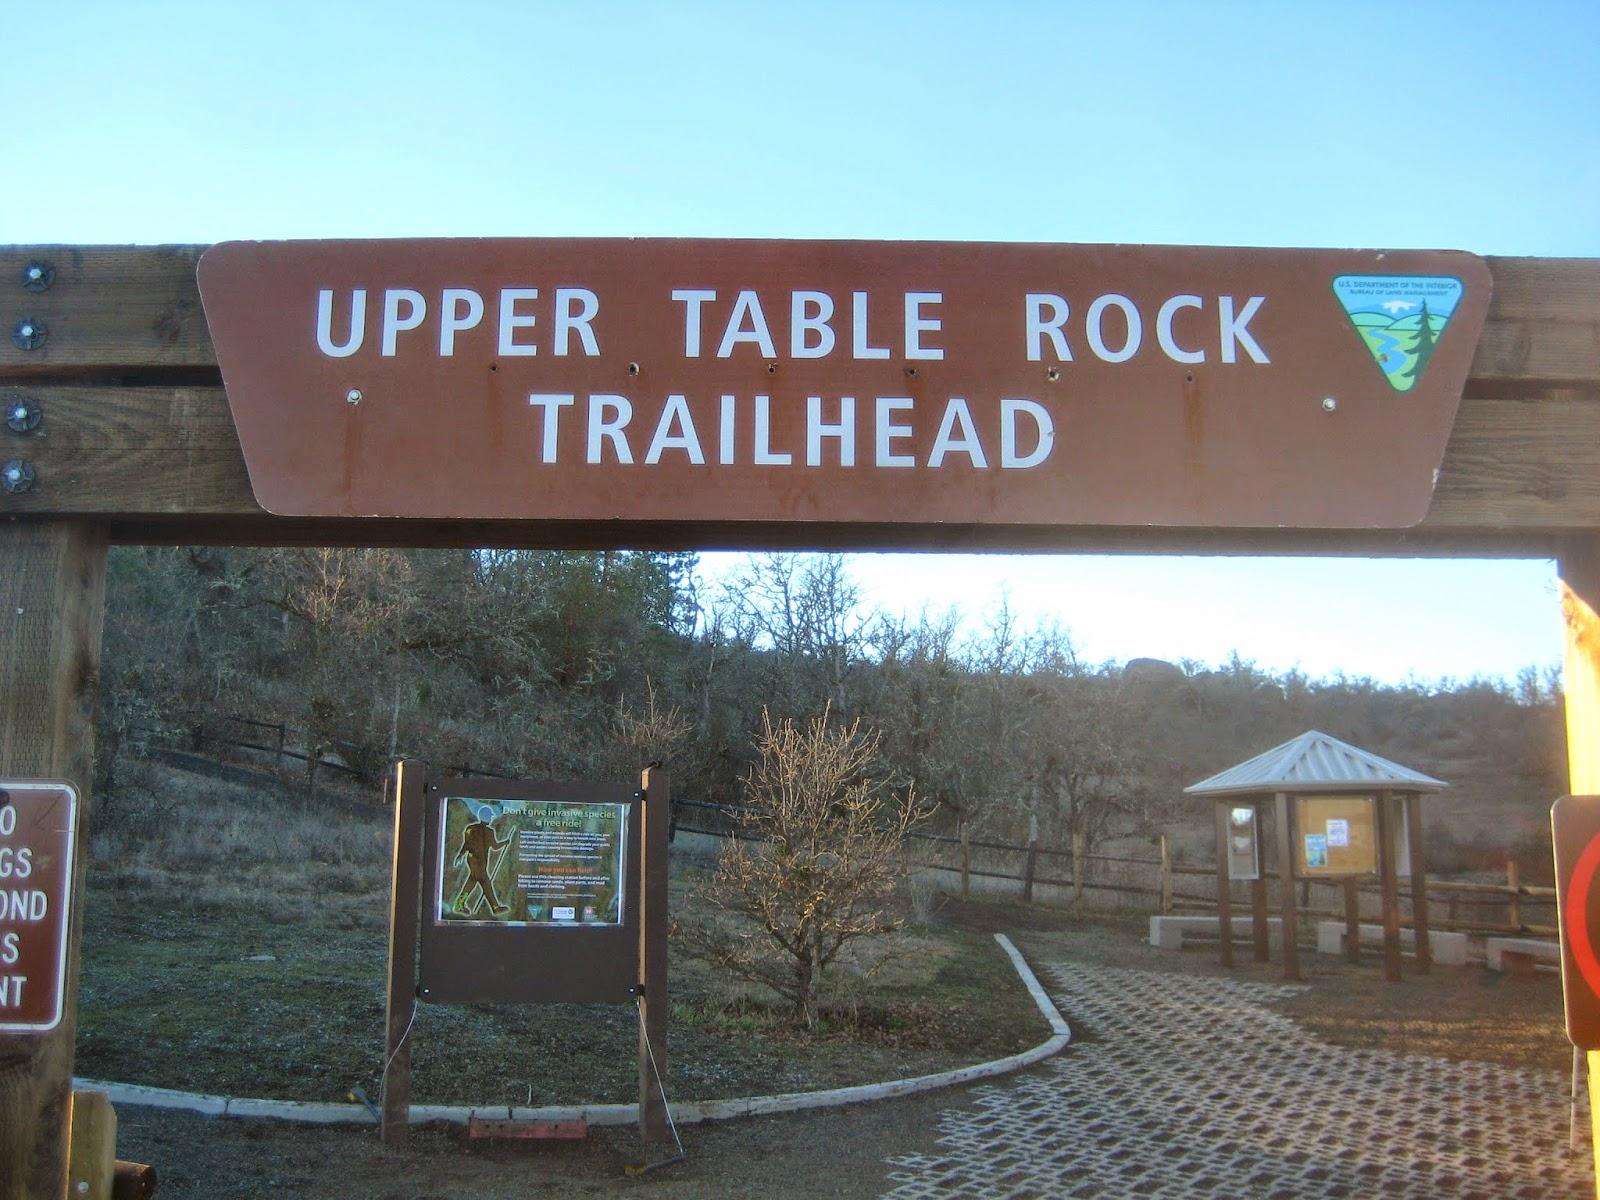 Remarkable Glenn Carols Hiking Adventures Upper Table Rock Trail Home Interior And Landscaping Dextoversignezvosmurscom